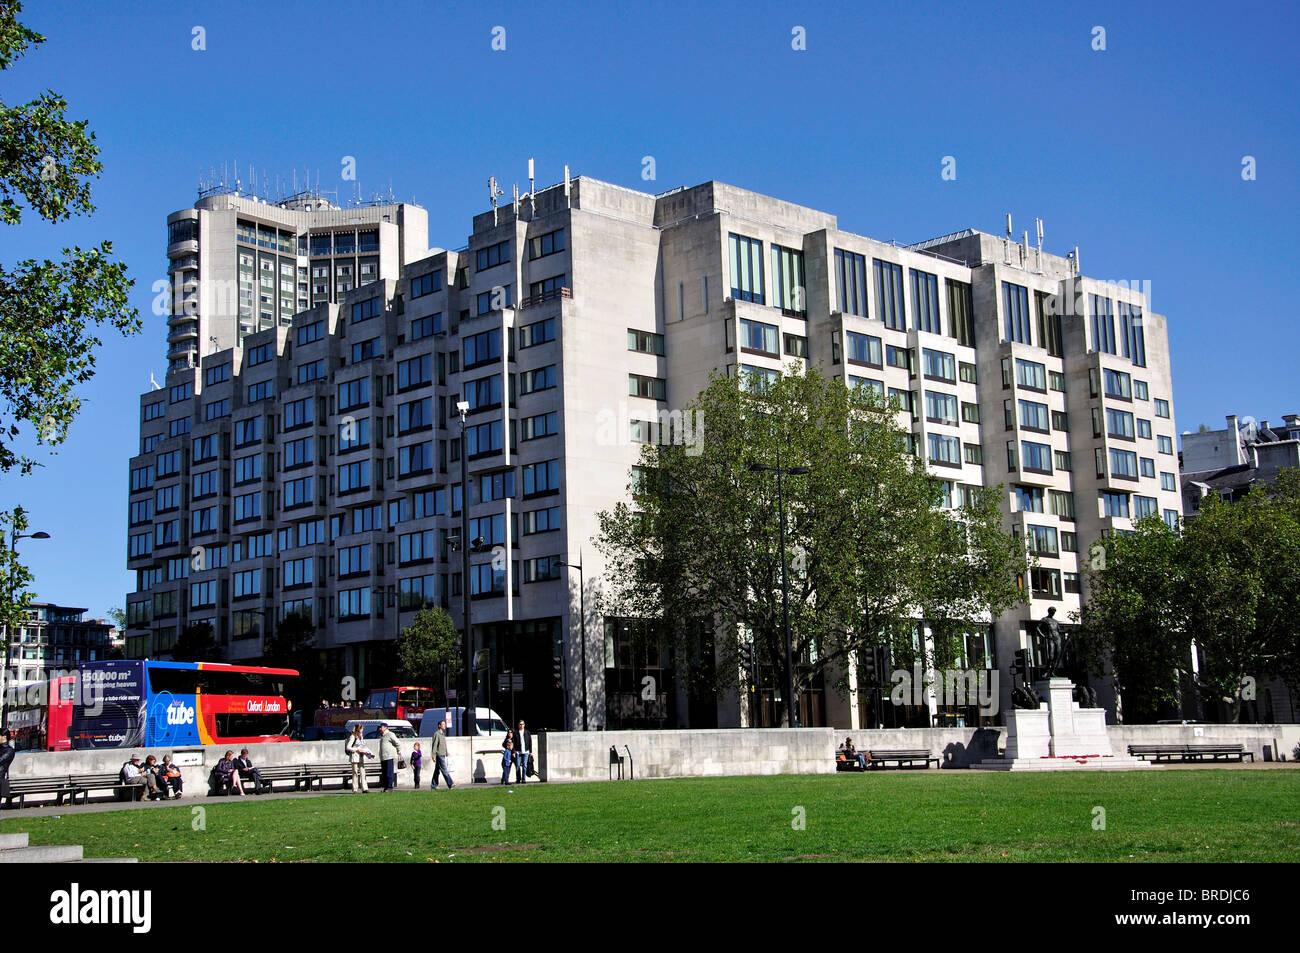 InterContinental Hotel, Hyde Park Corner, City of Westminster, London, England, United Kingdom - Stock Image